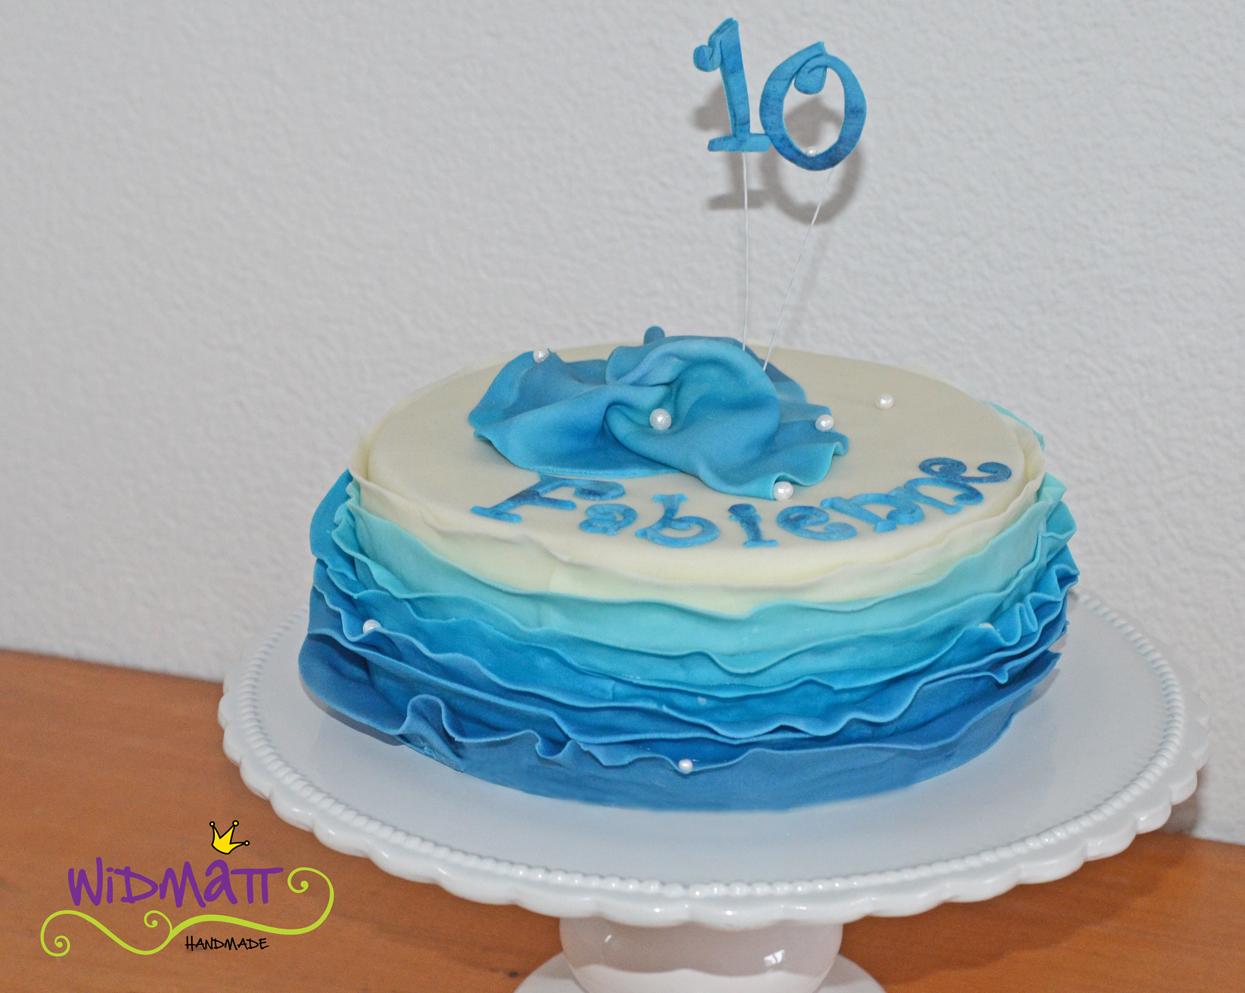 Torte In Wasser Optik Zum 10 Geburtstag Widmatt Atelierwidmatt Atelier